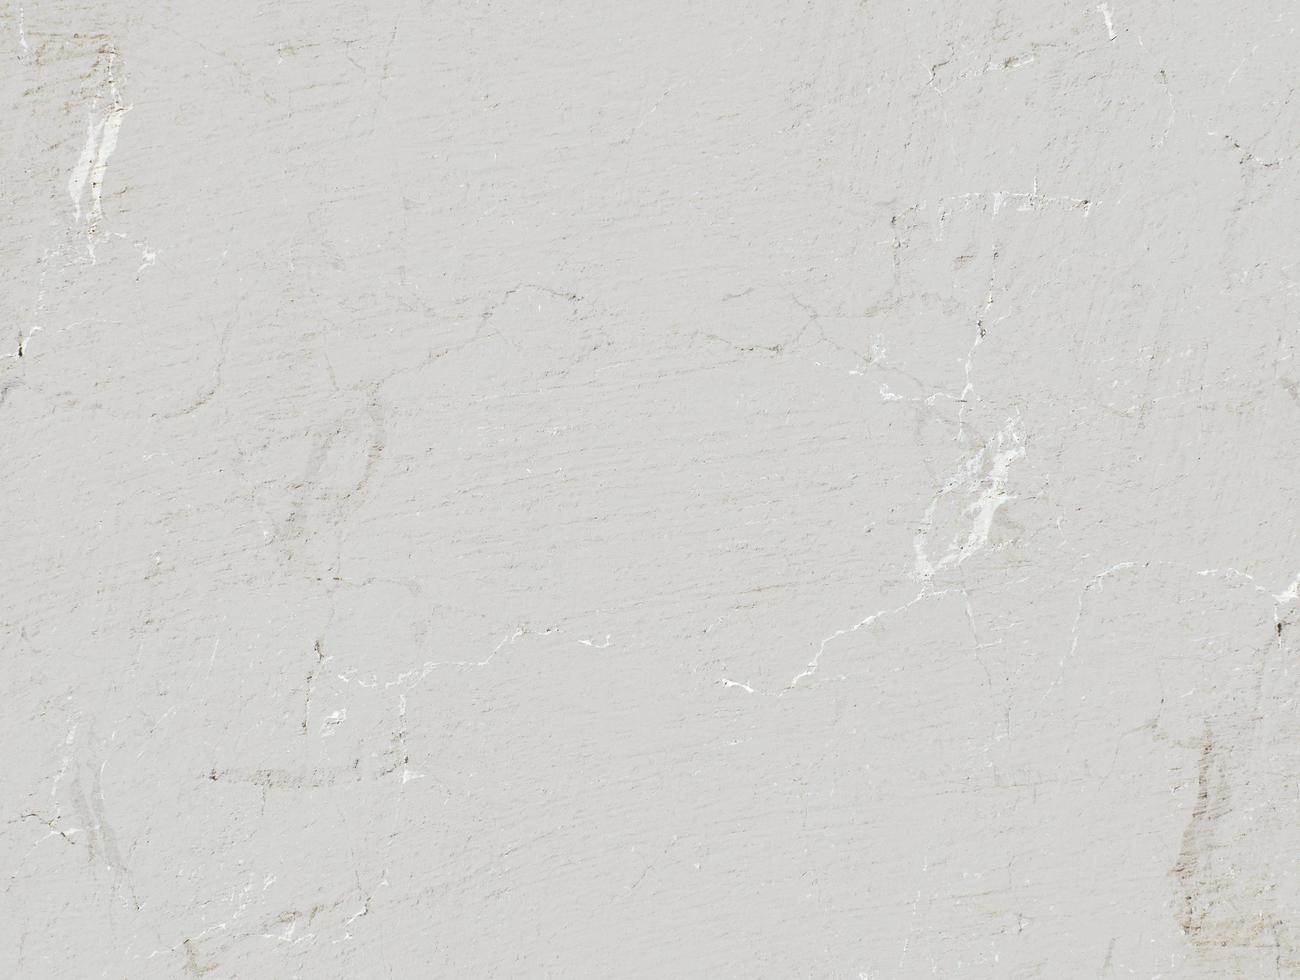 textura de pared grunge neutral foto